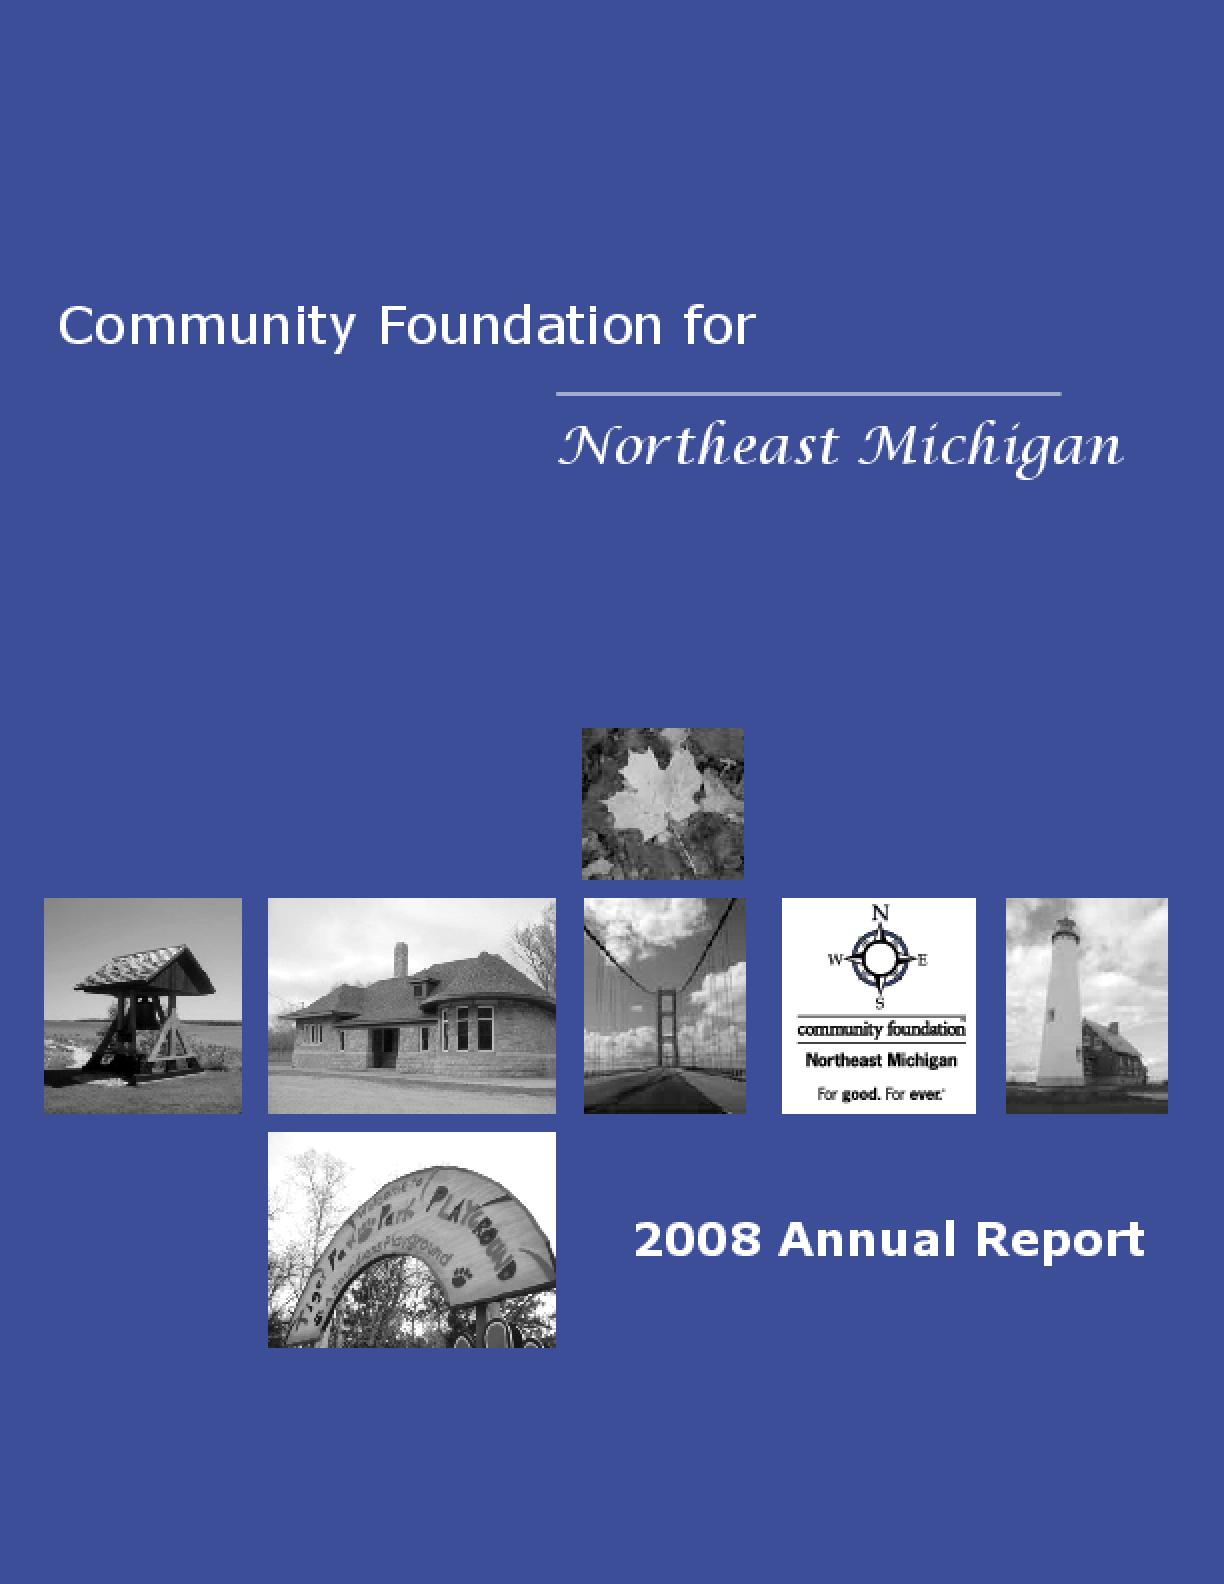 Community Foundation for Northeast Michigan - 2008 Annual Report